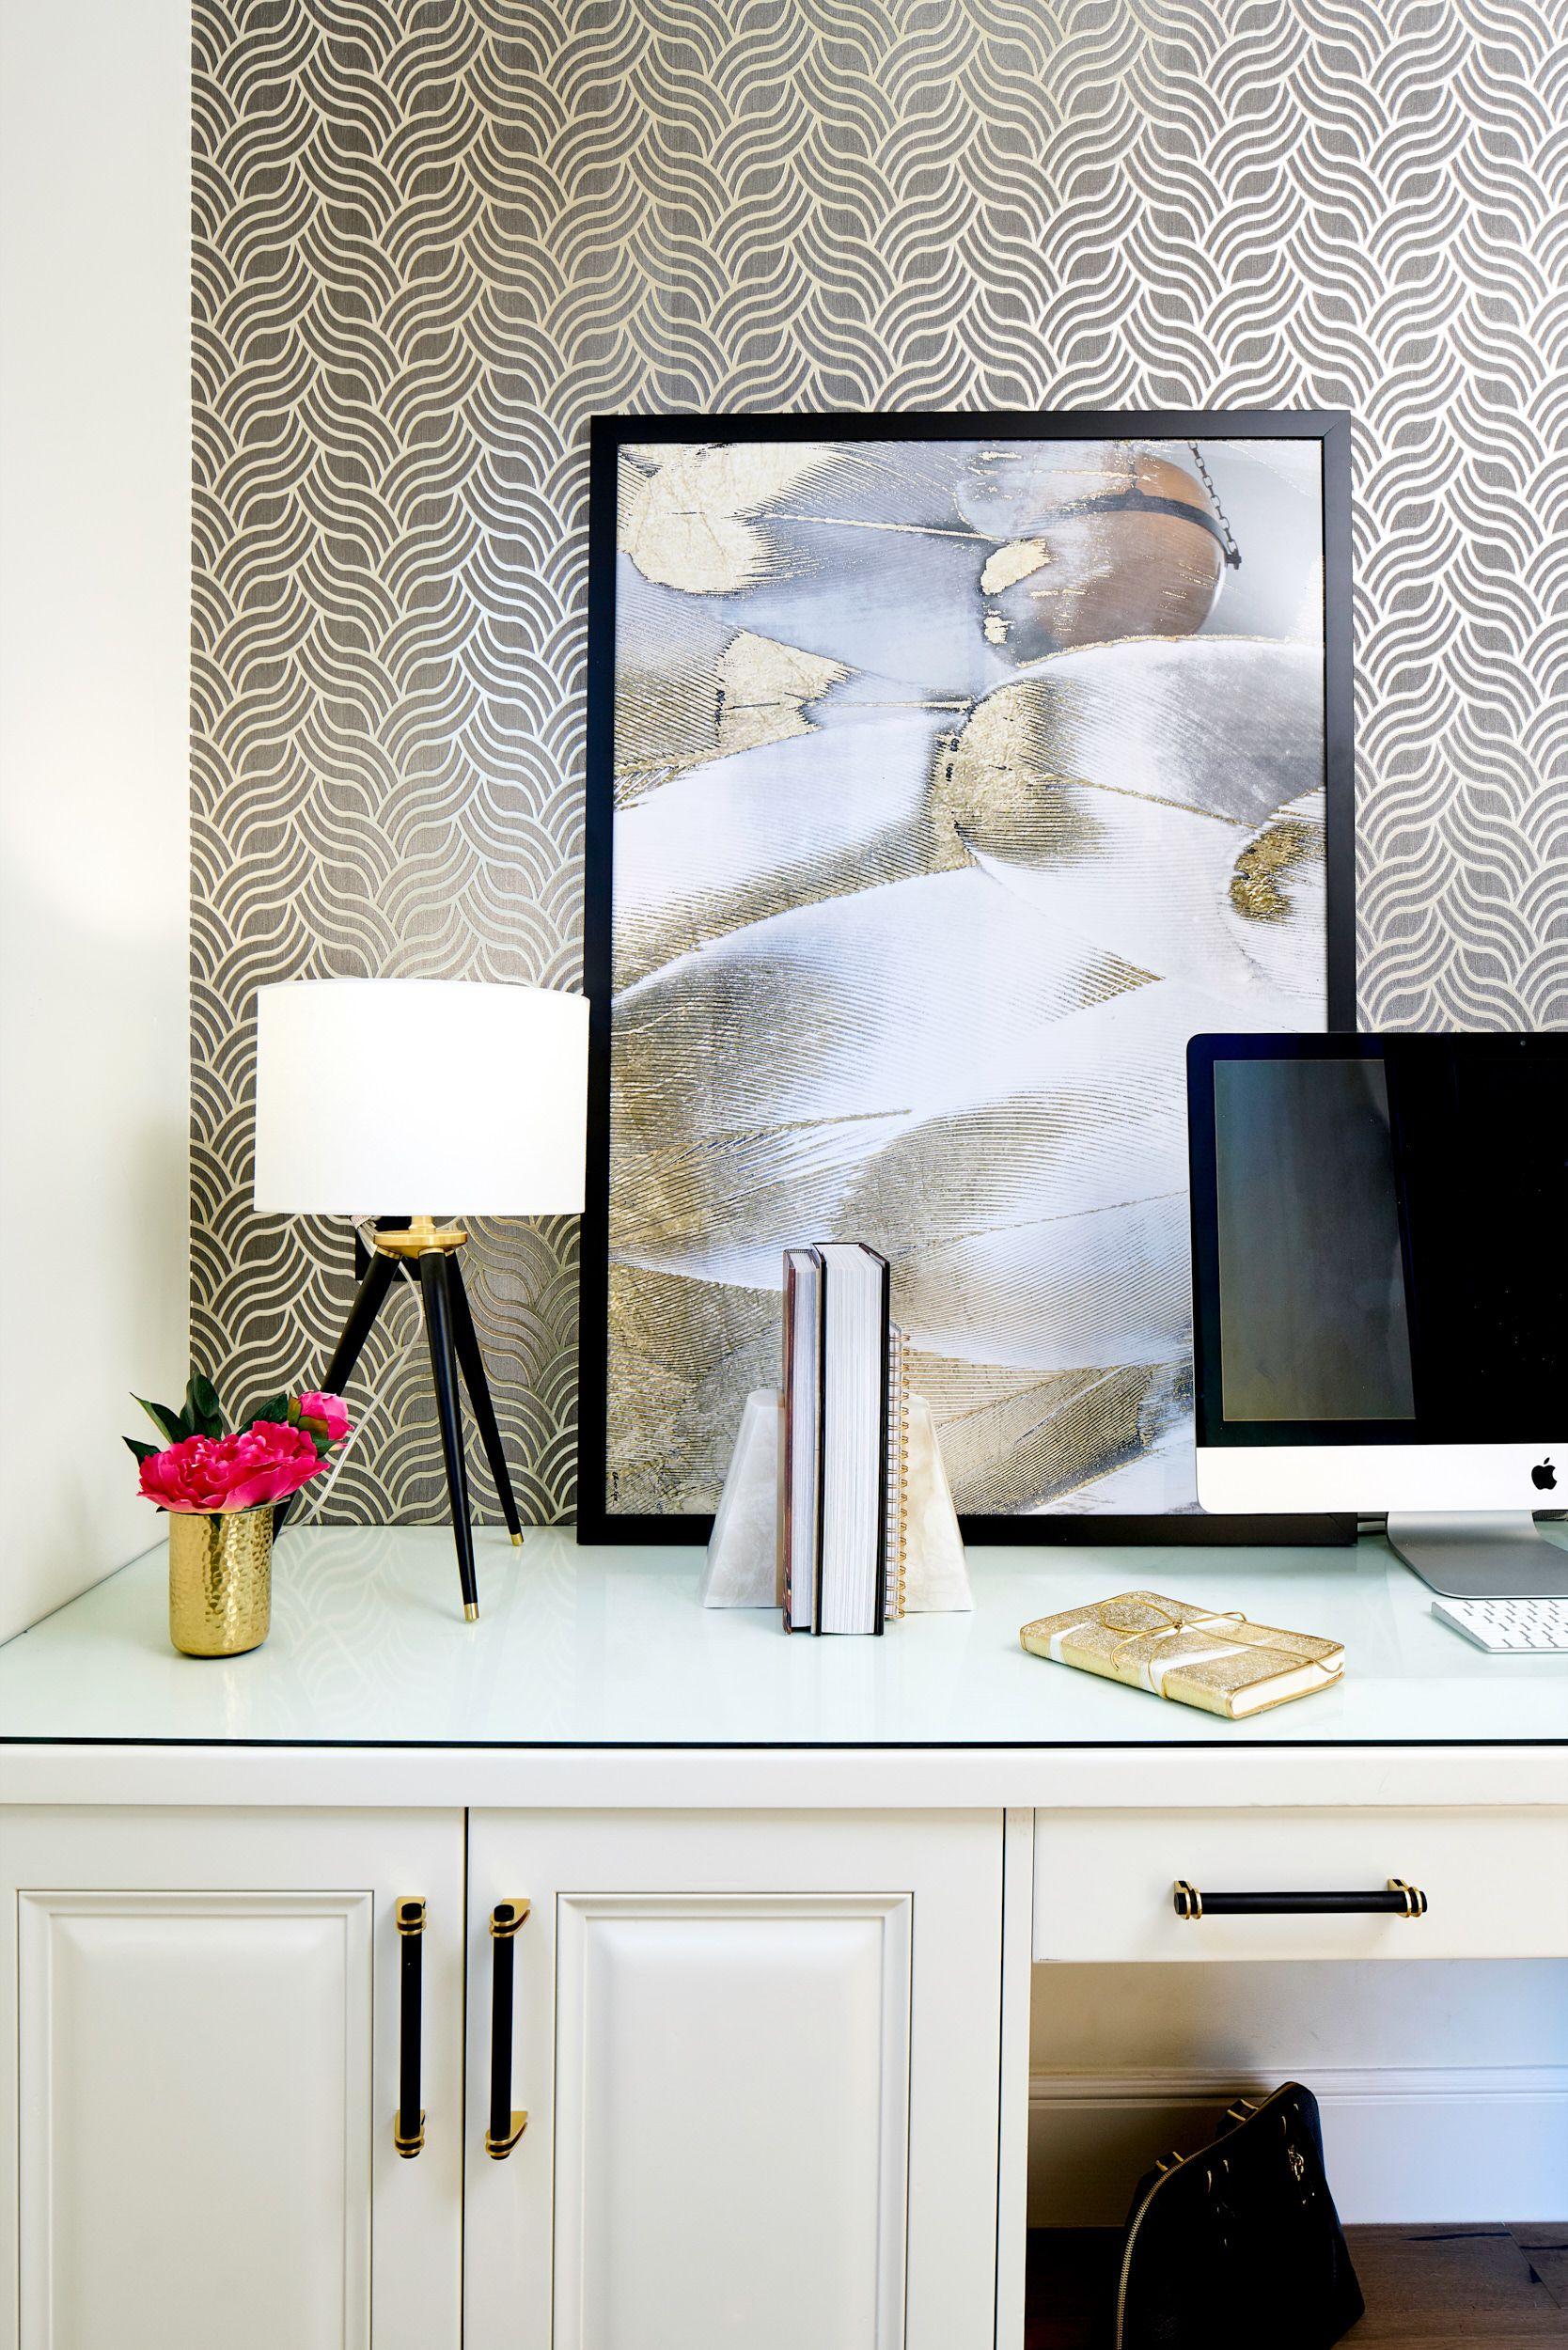 Black White And Gold Transitional Kitchen With European White Oak Floors Kitchen Desk Area European White Oak Floors Wallpaper Accent Wall White Oak Floors